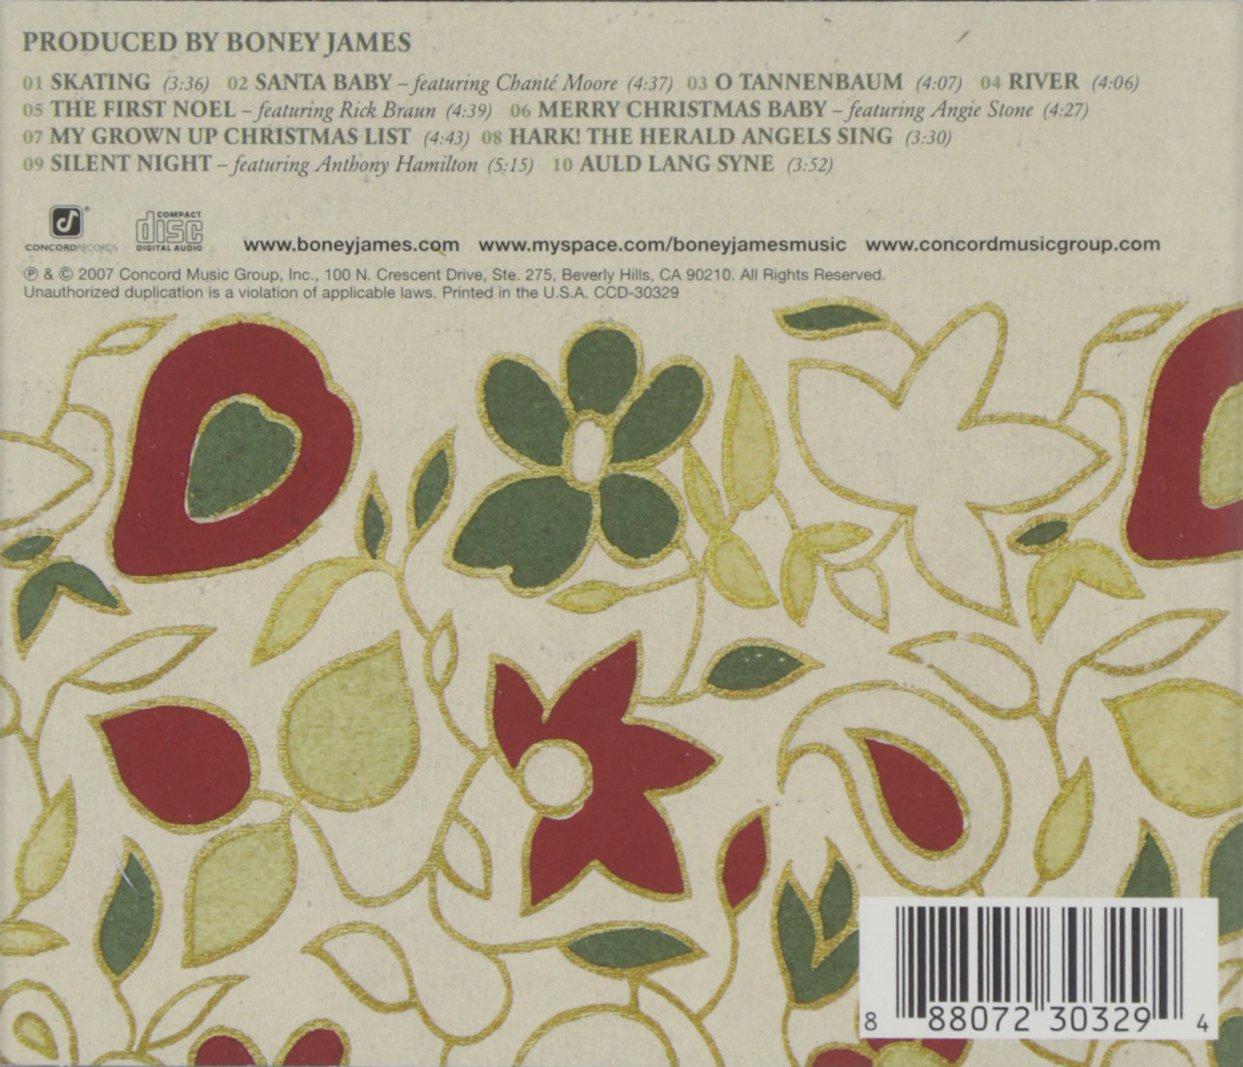 Christmas Present - Boney James: Amazon.de: Musik